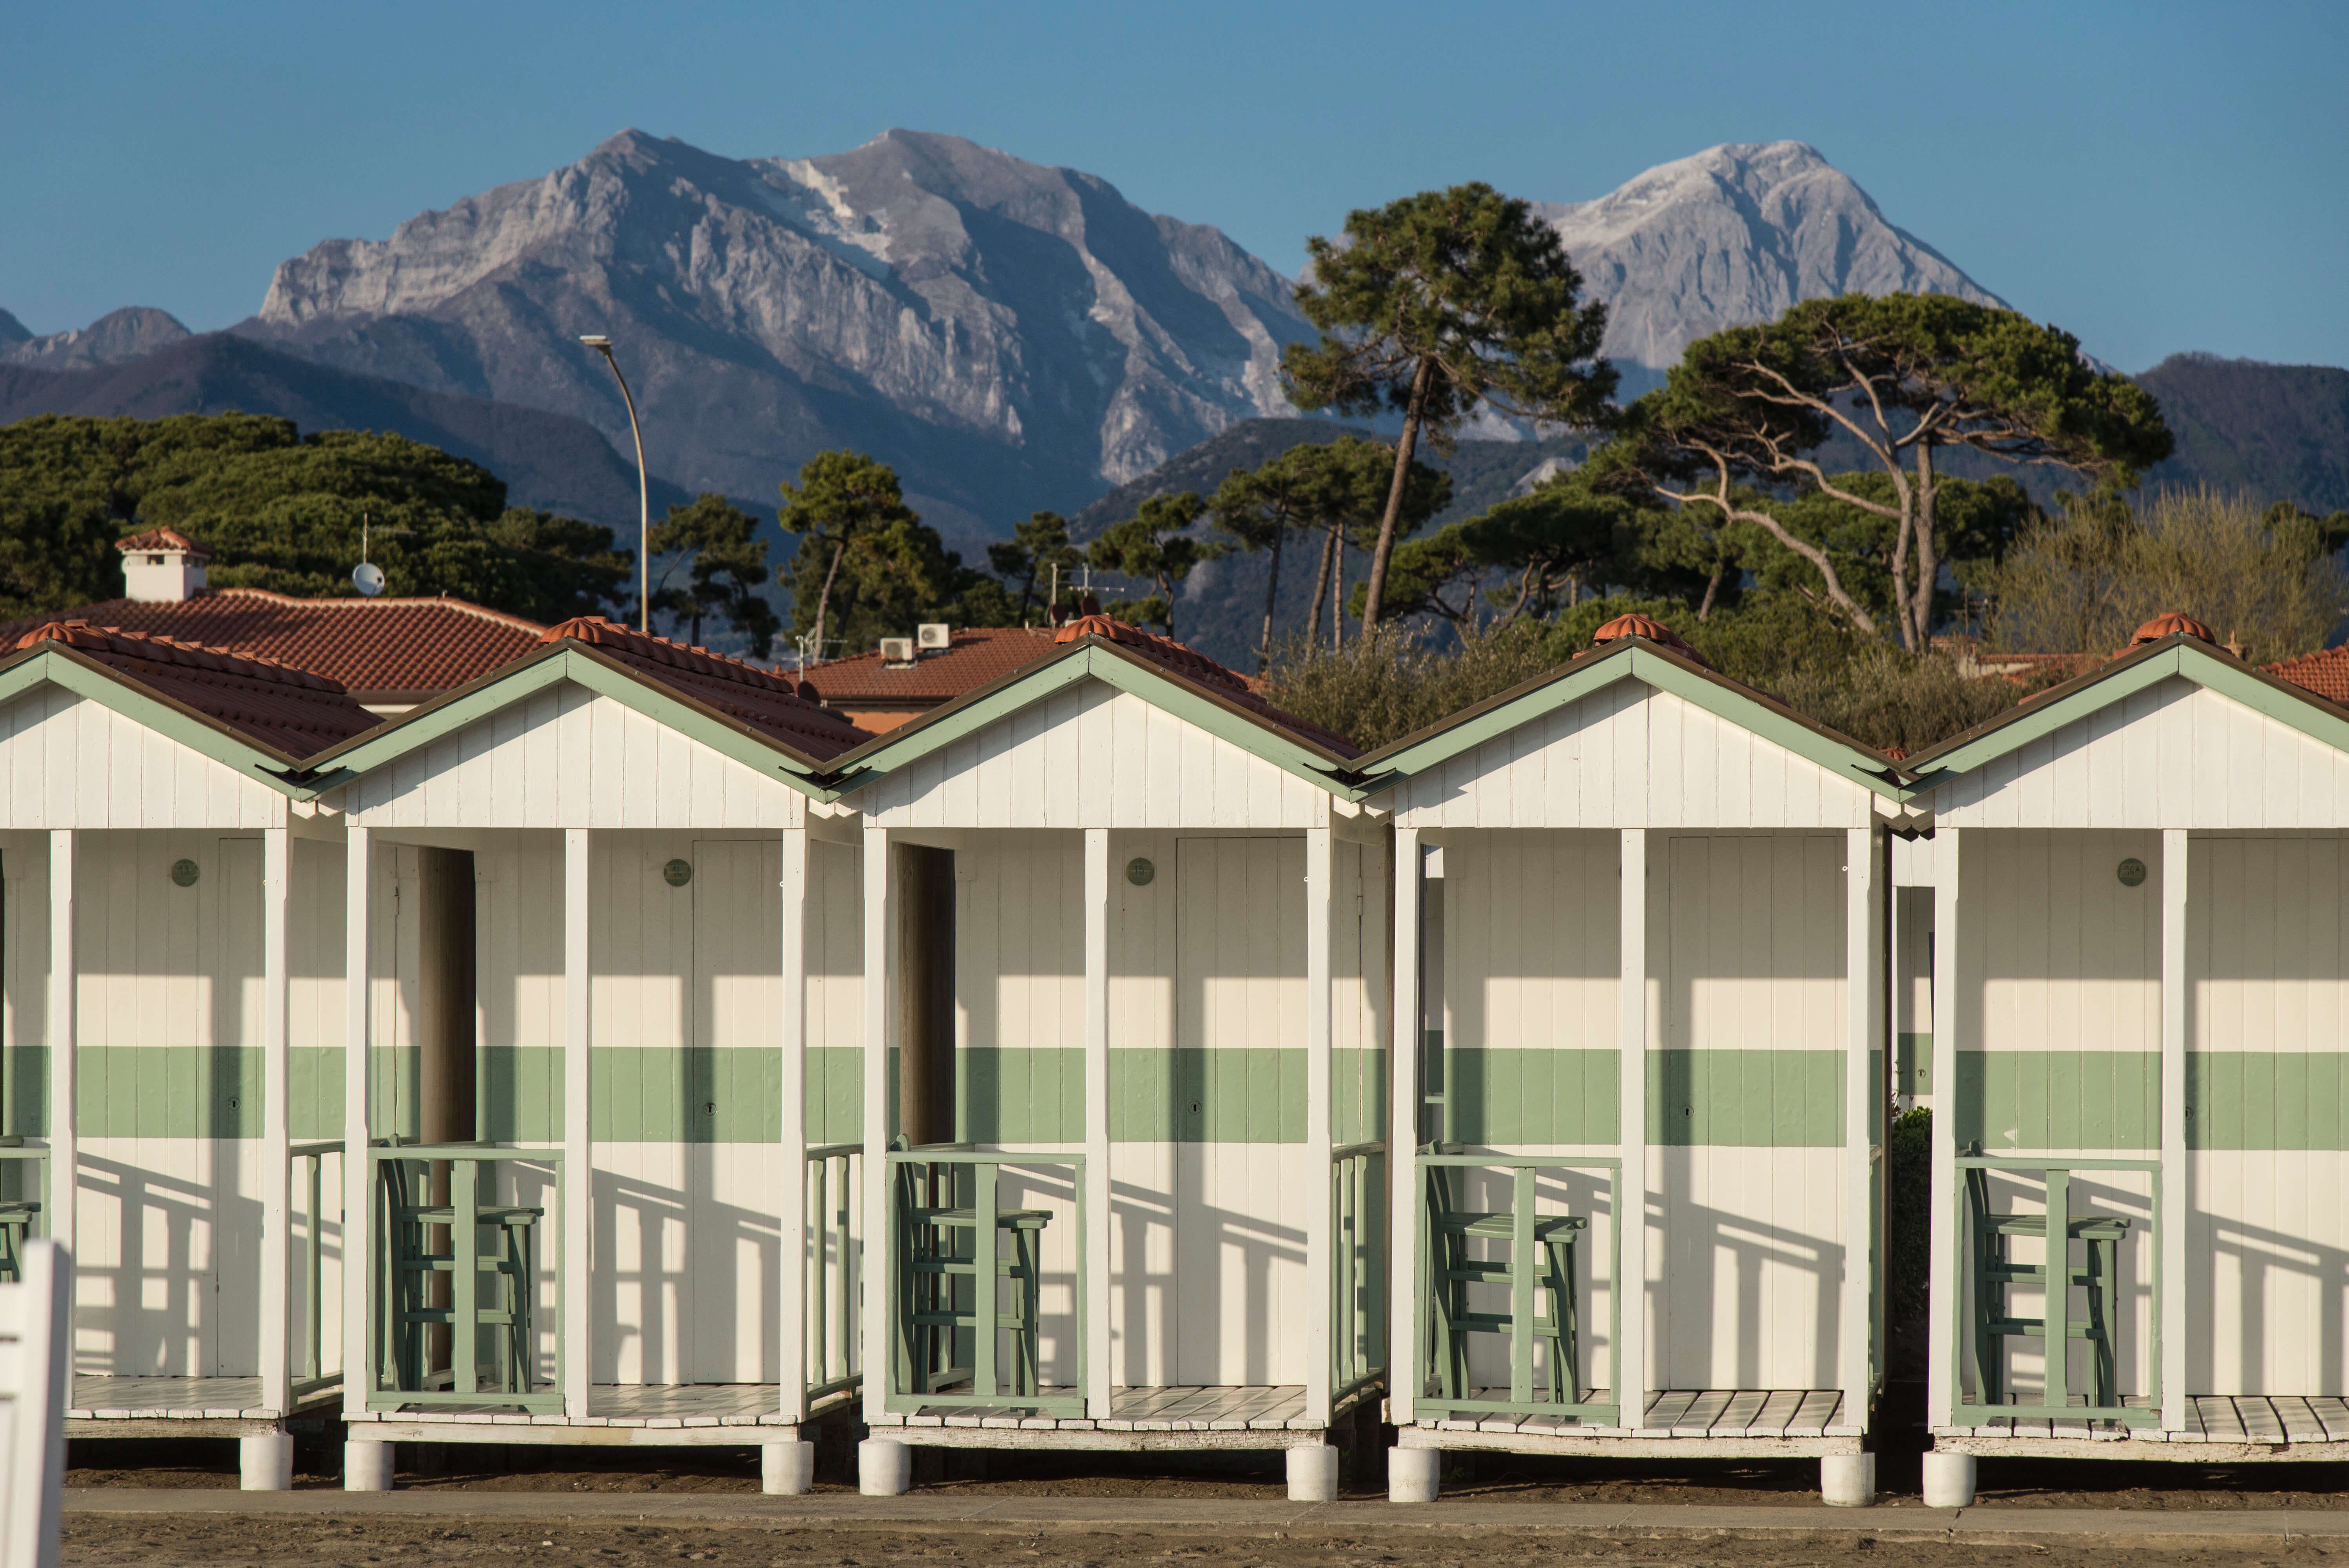 Tourist information - Forte Dei Marmi